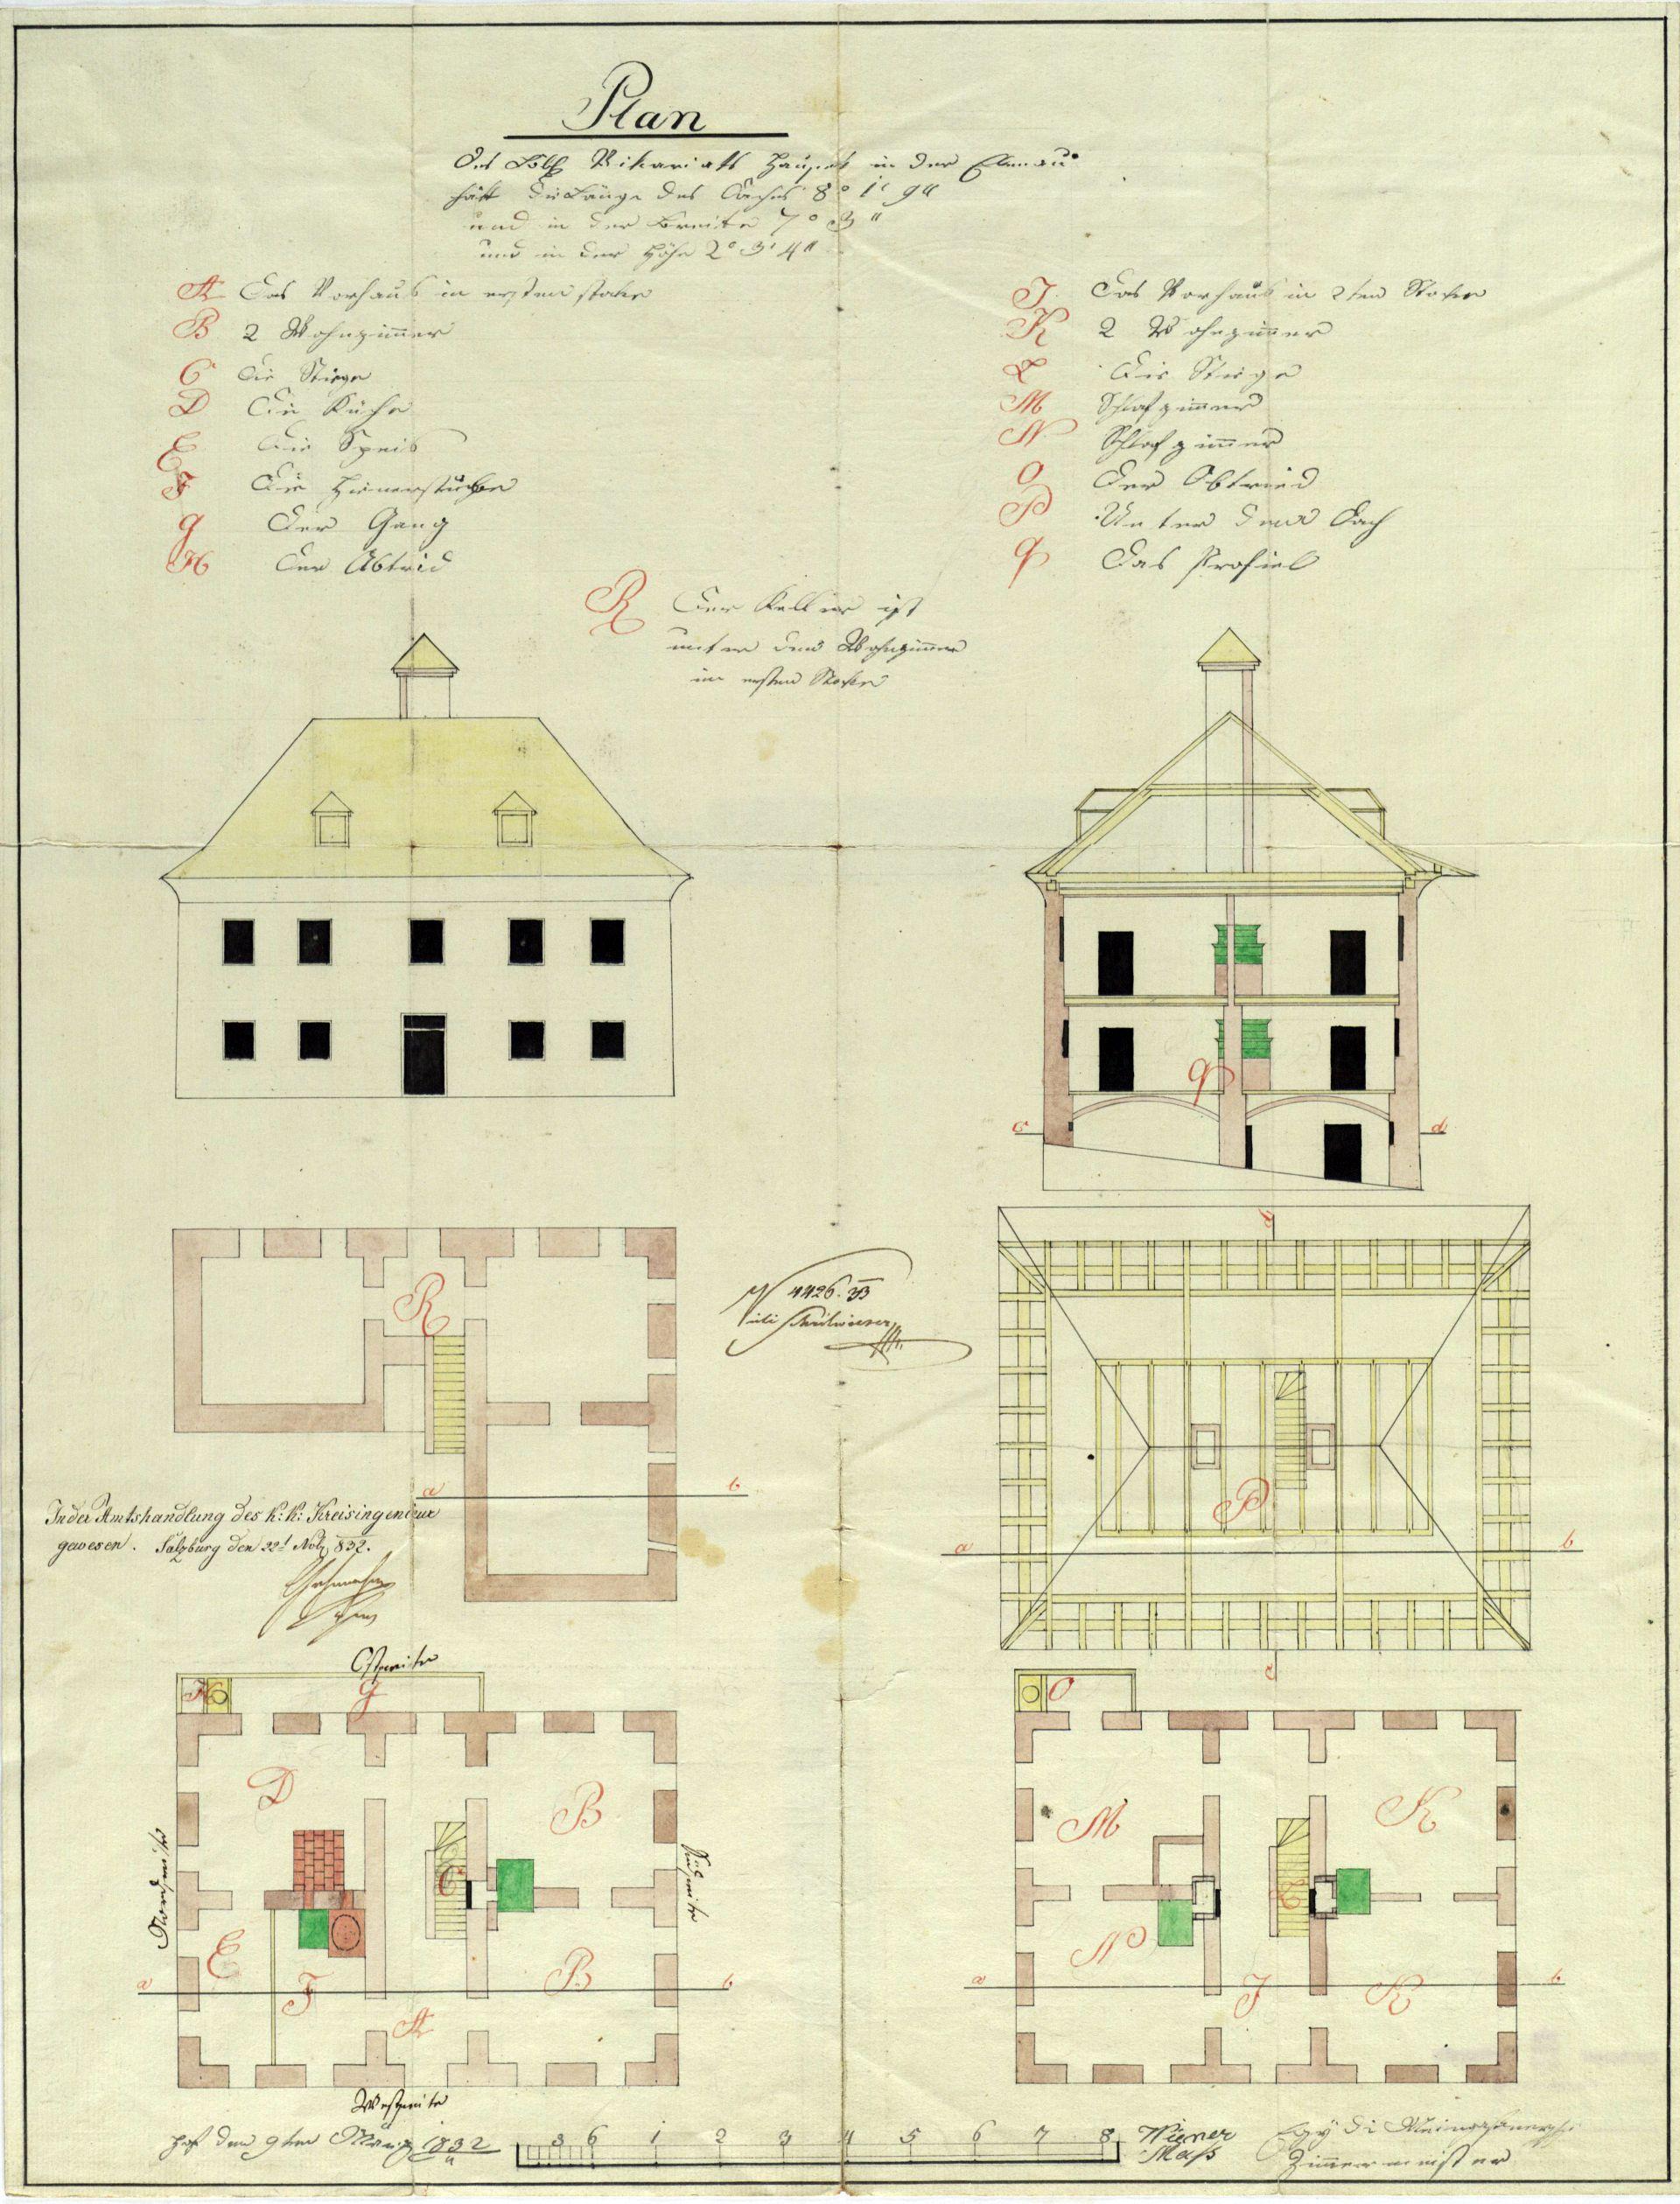 Plan des Vikariatshauses in Ebenau von Egyd Meingaßner